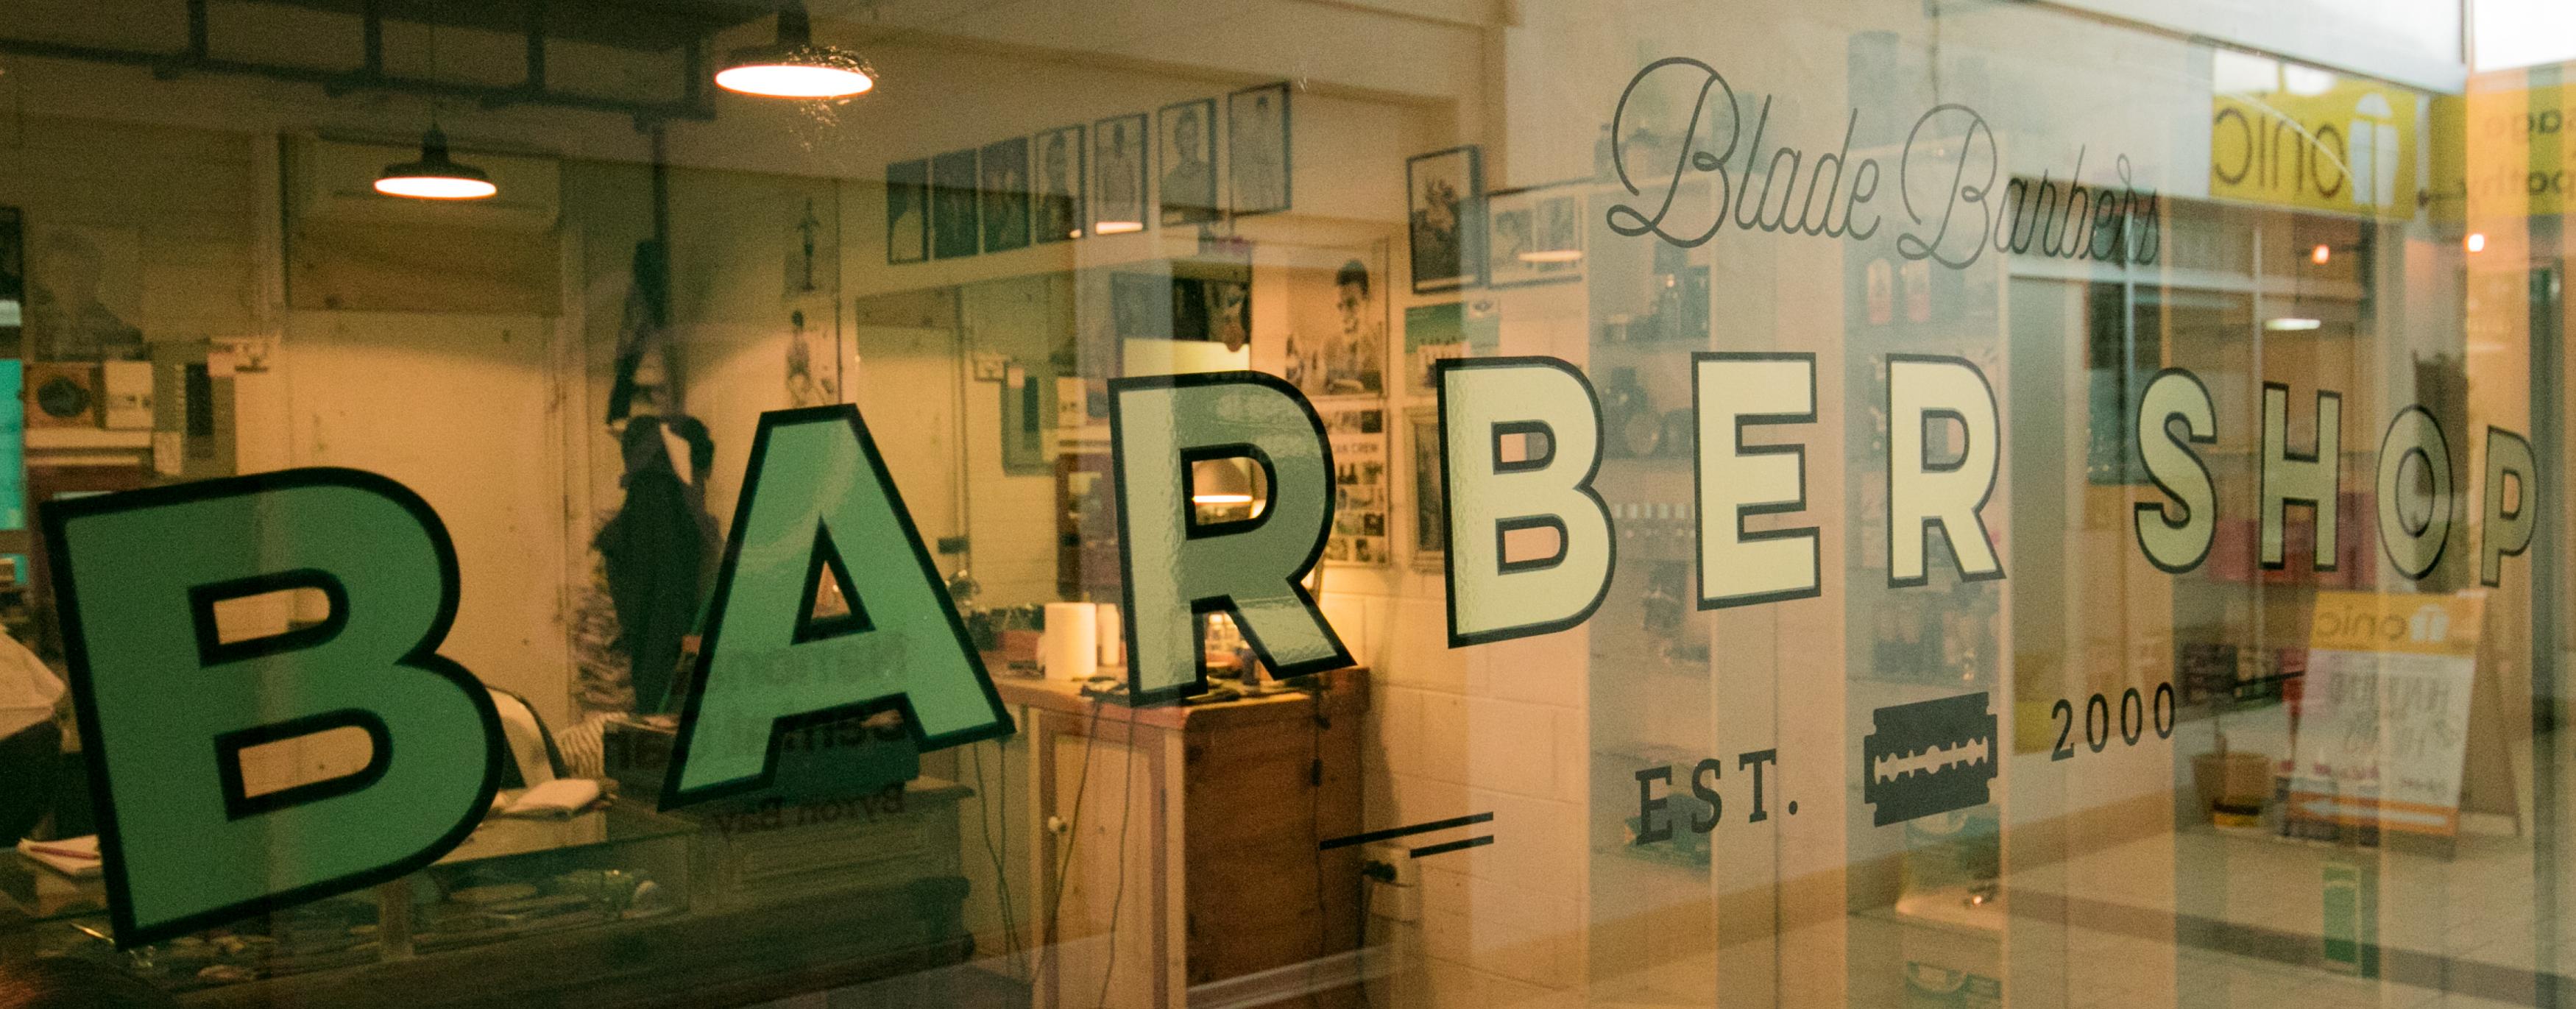 sign blade barbers byron bay haridresser